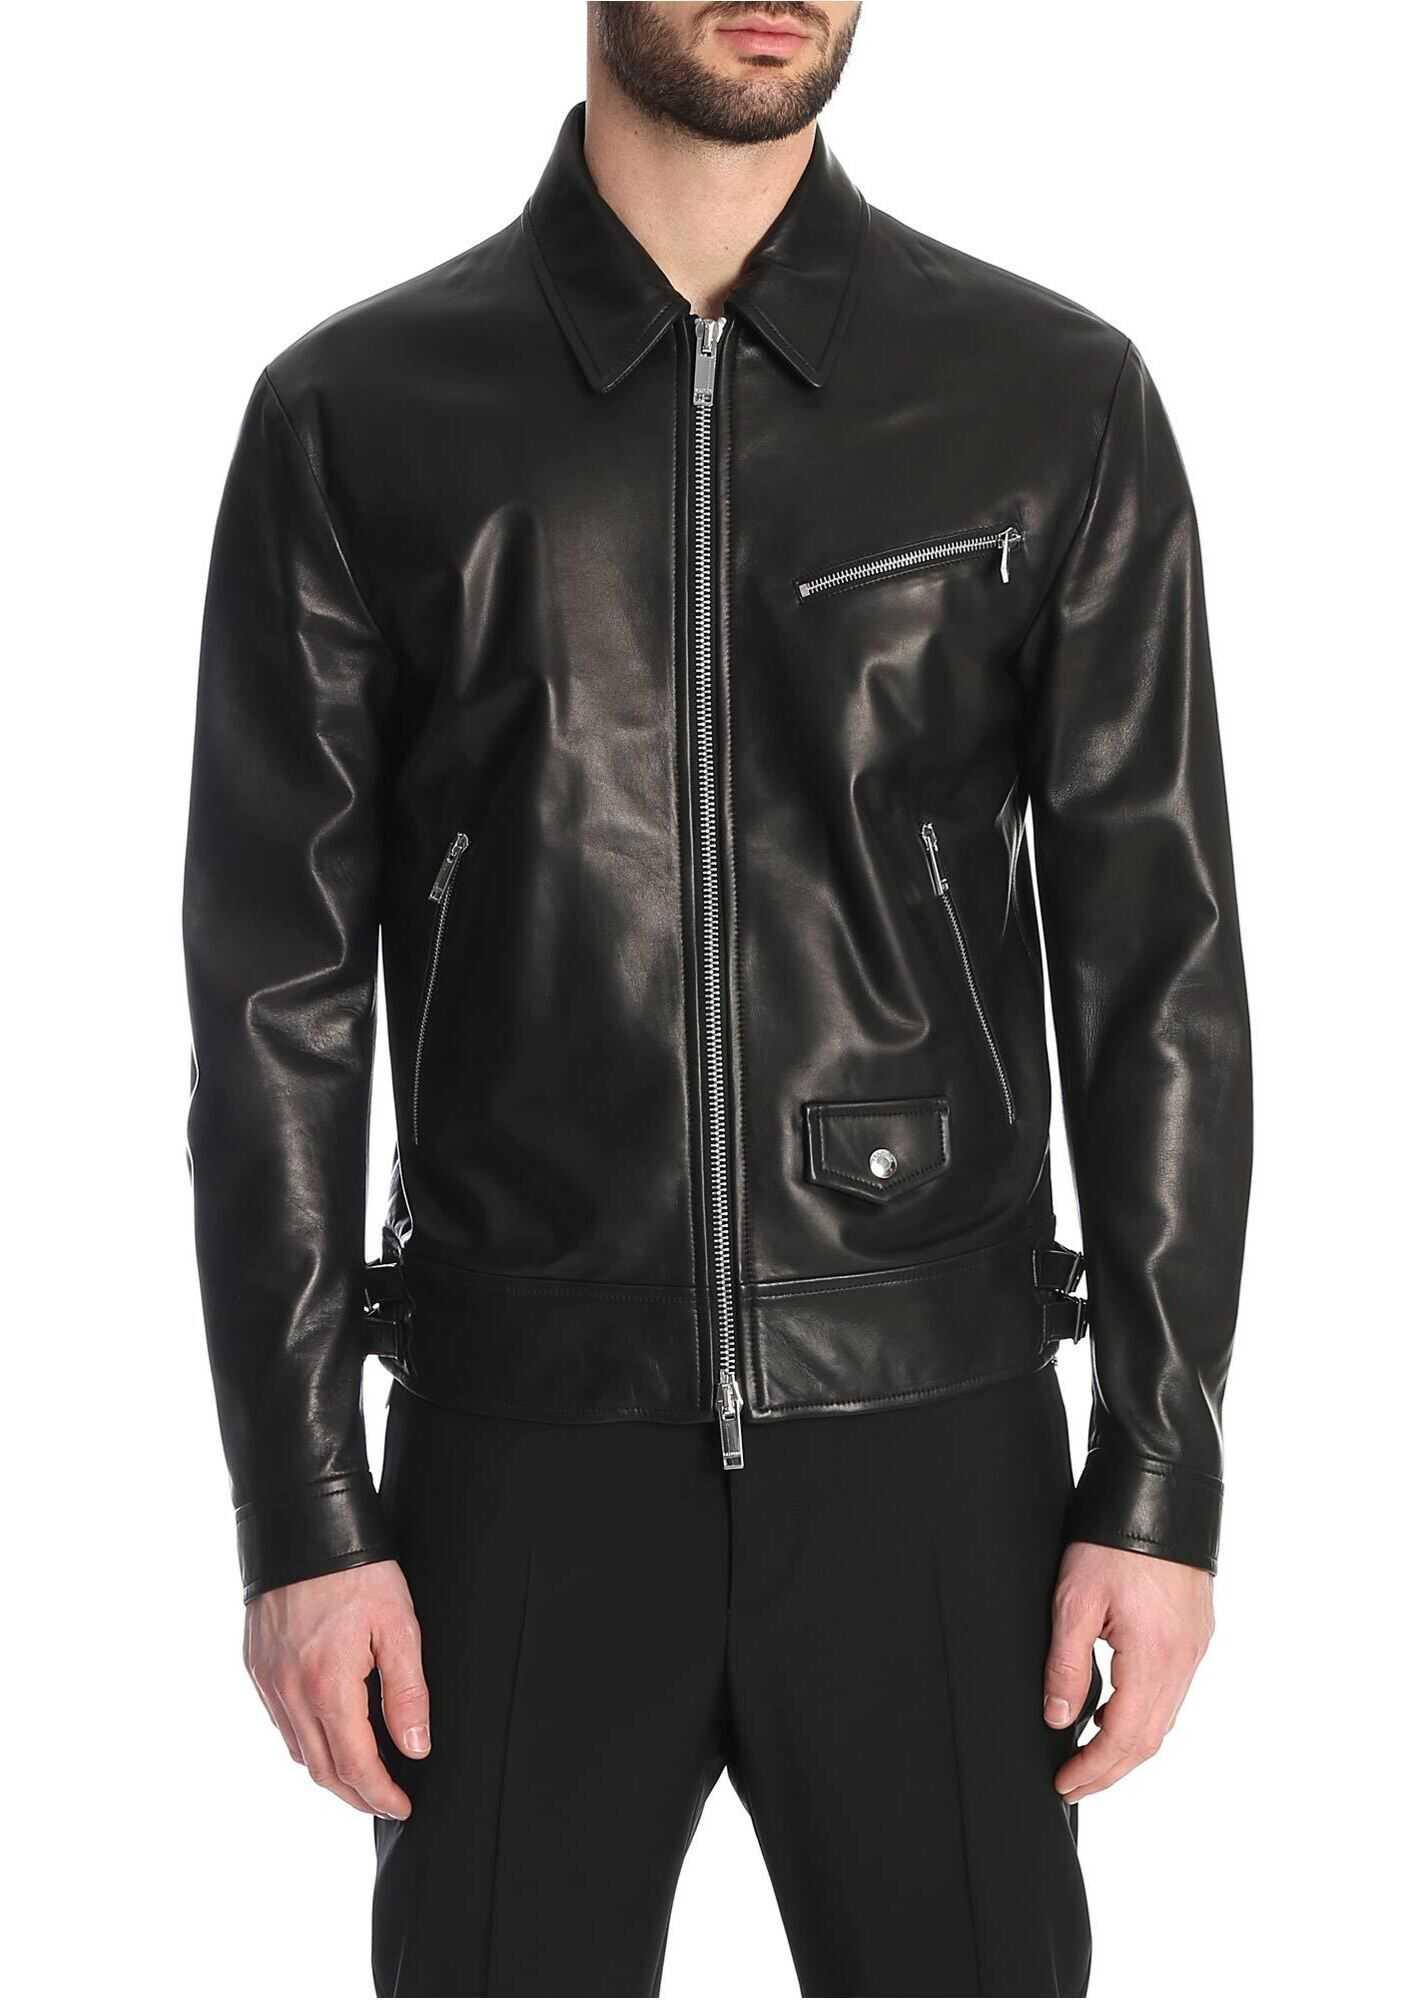 Valentino Garavani Vltn Detail Leather Jacket In Black Black imagine